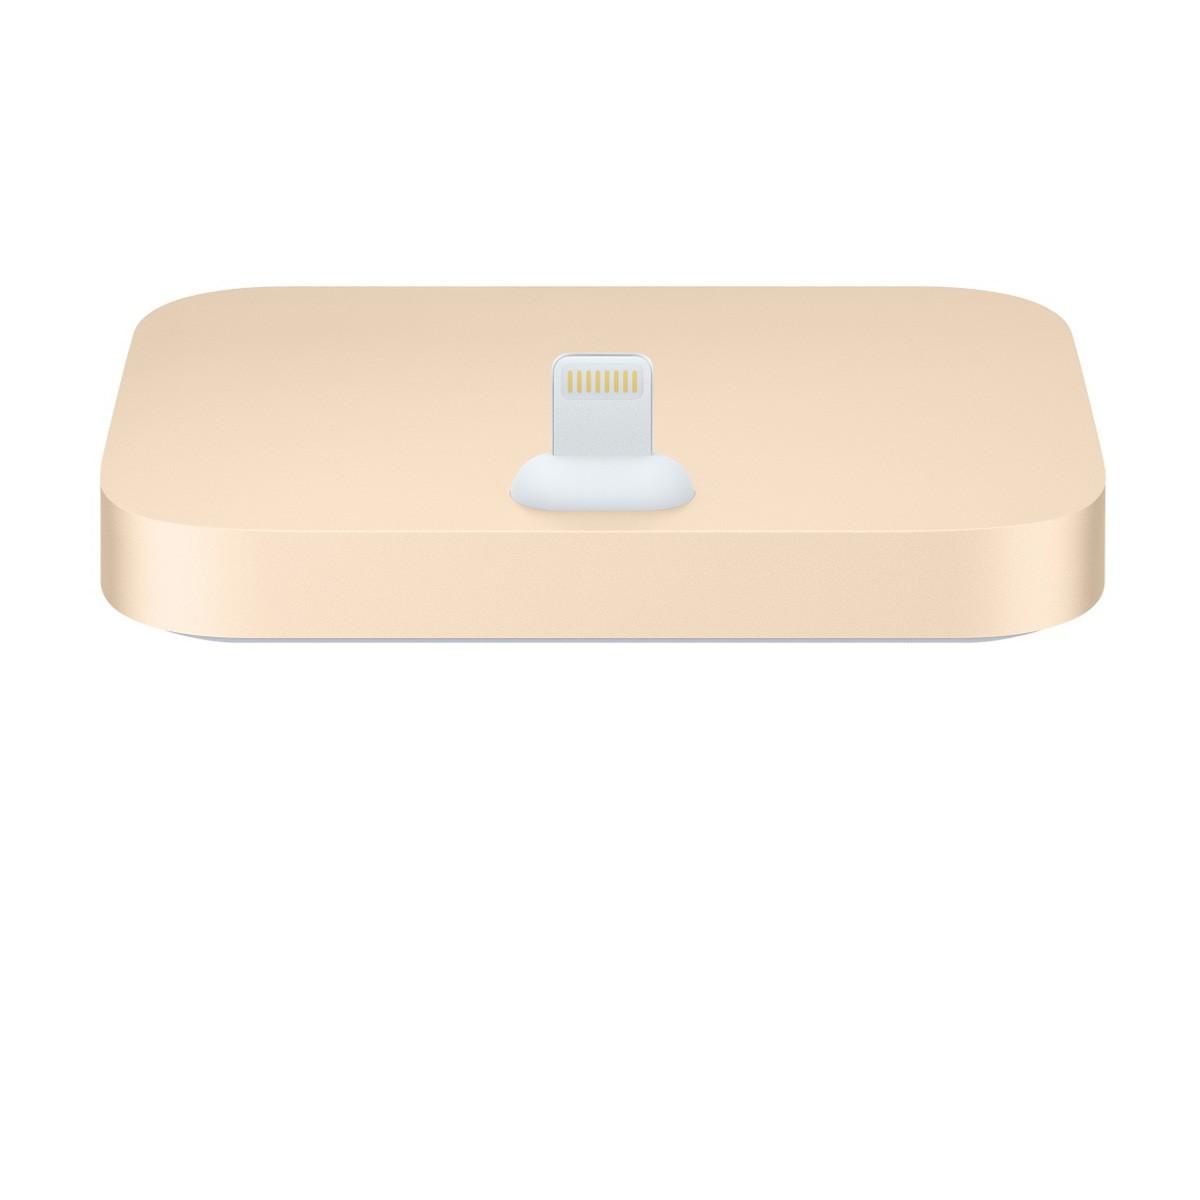 Apple iPhone Lightning Dock - zlatý ml8k2zm/a